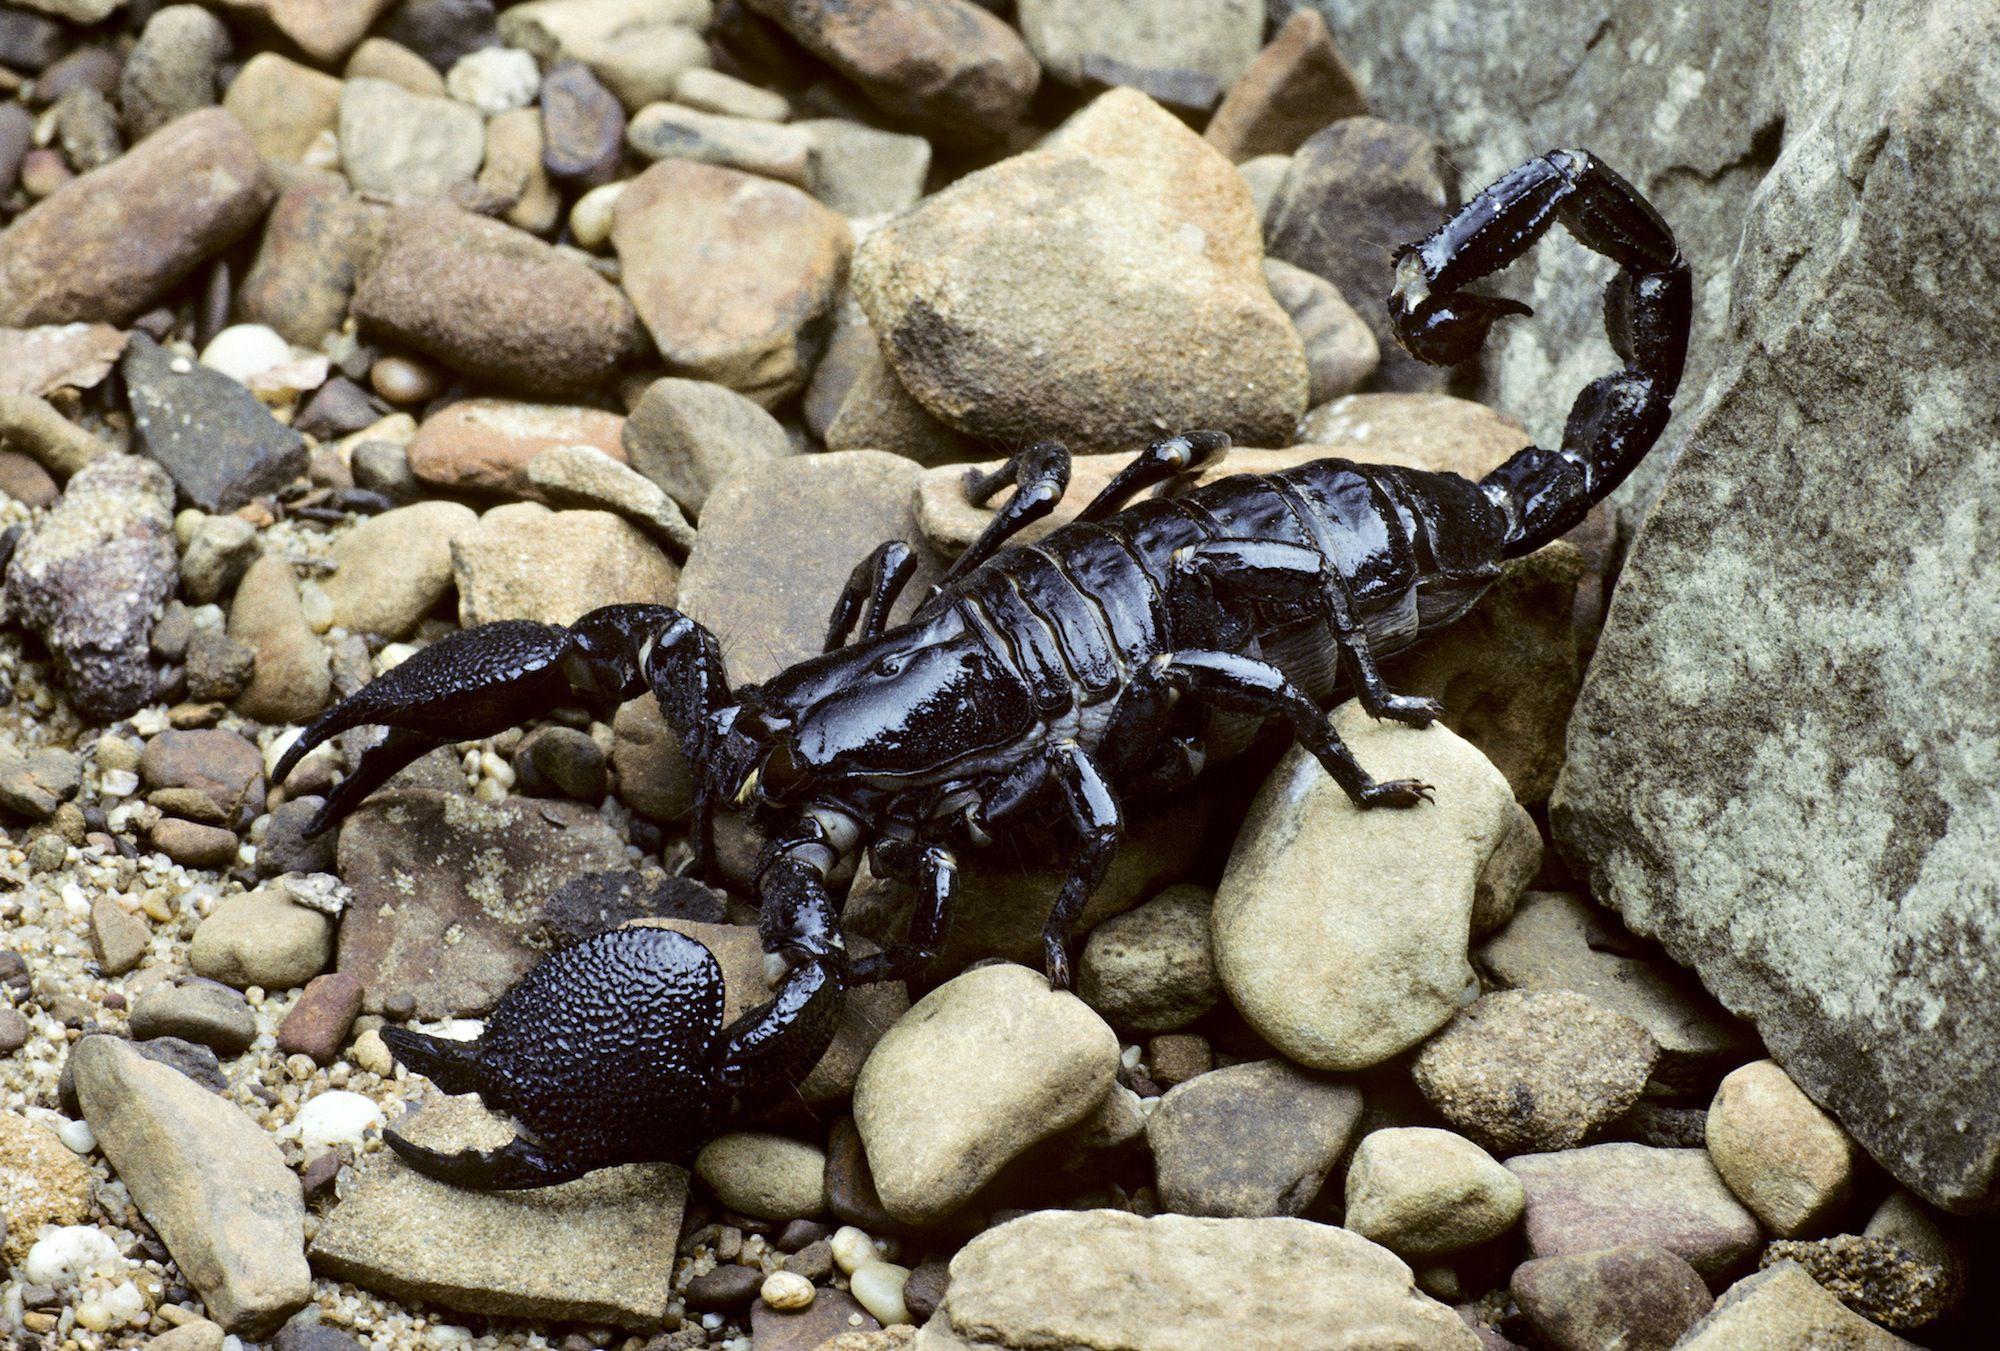 Scorpion Anatomy - The Basics